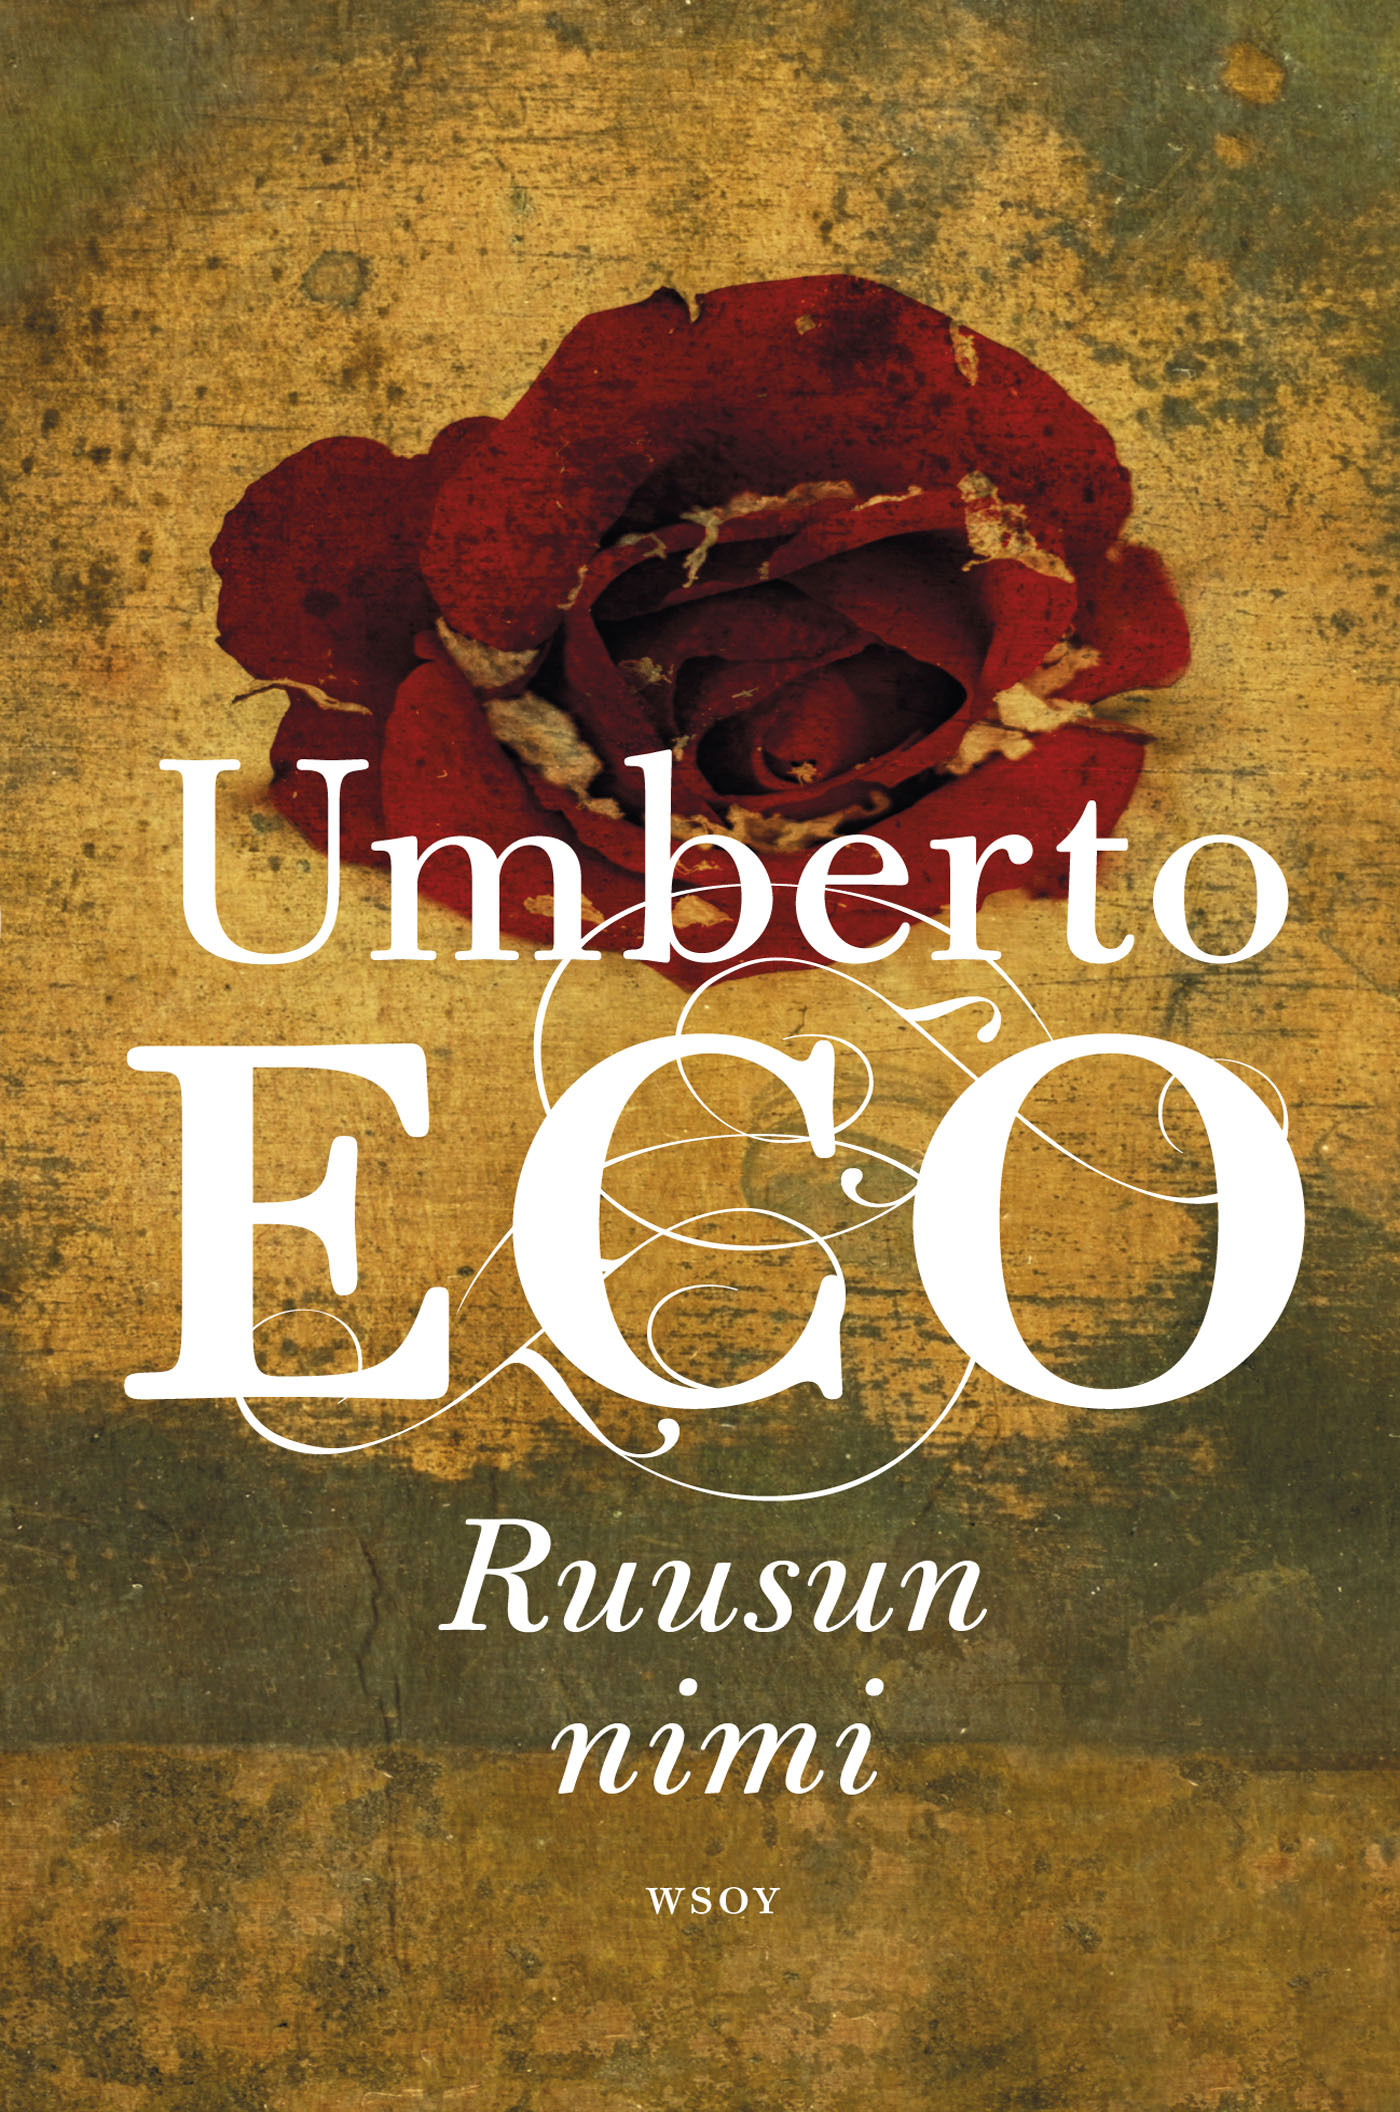 Eco, Umberto - Ruusun nimi, e-kirja